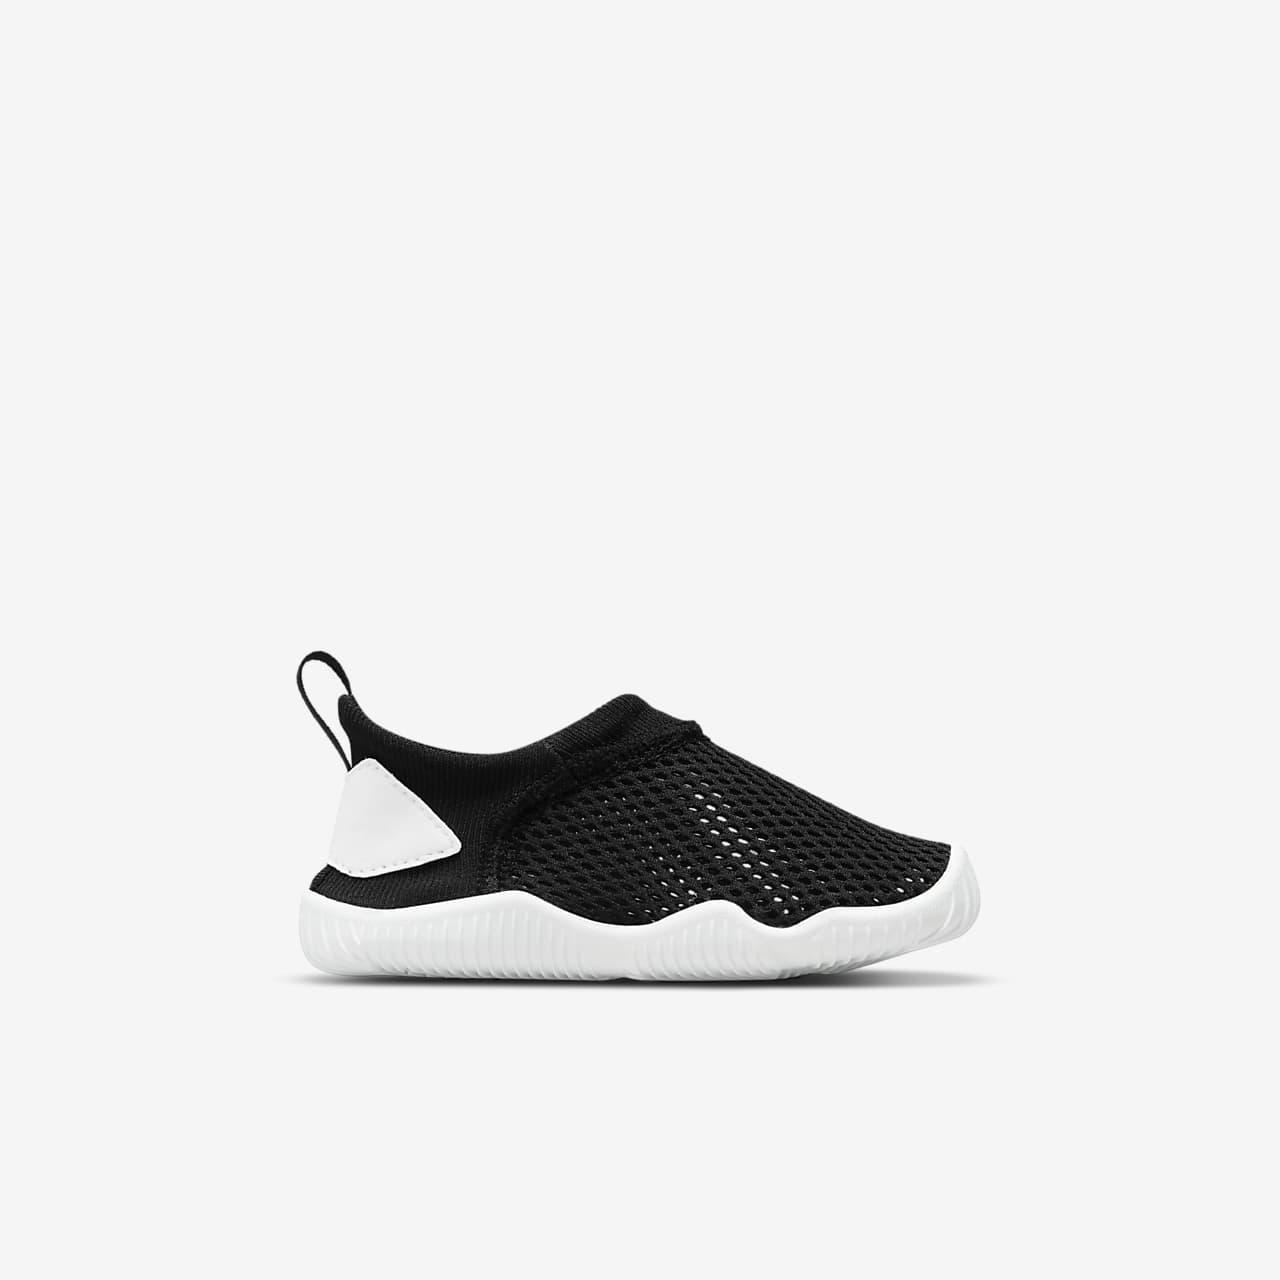 4a72cf64db2 Nike Aqua Sock 360 Infant Toddler Shoe. Nike.com